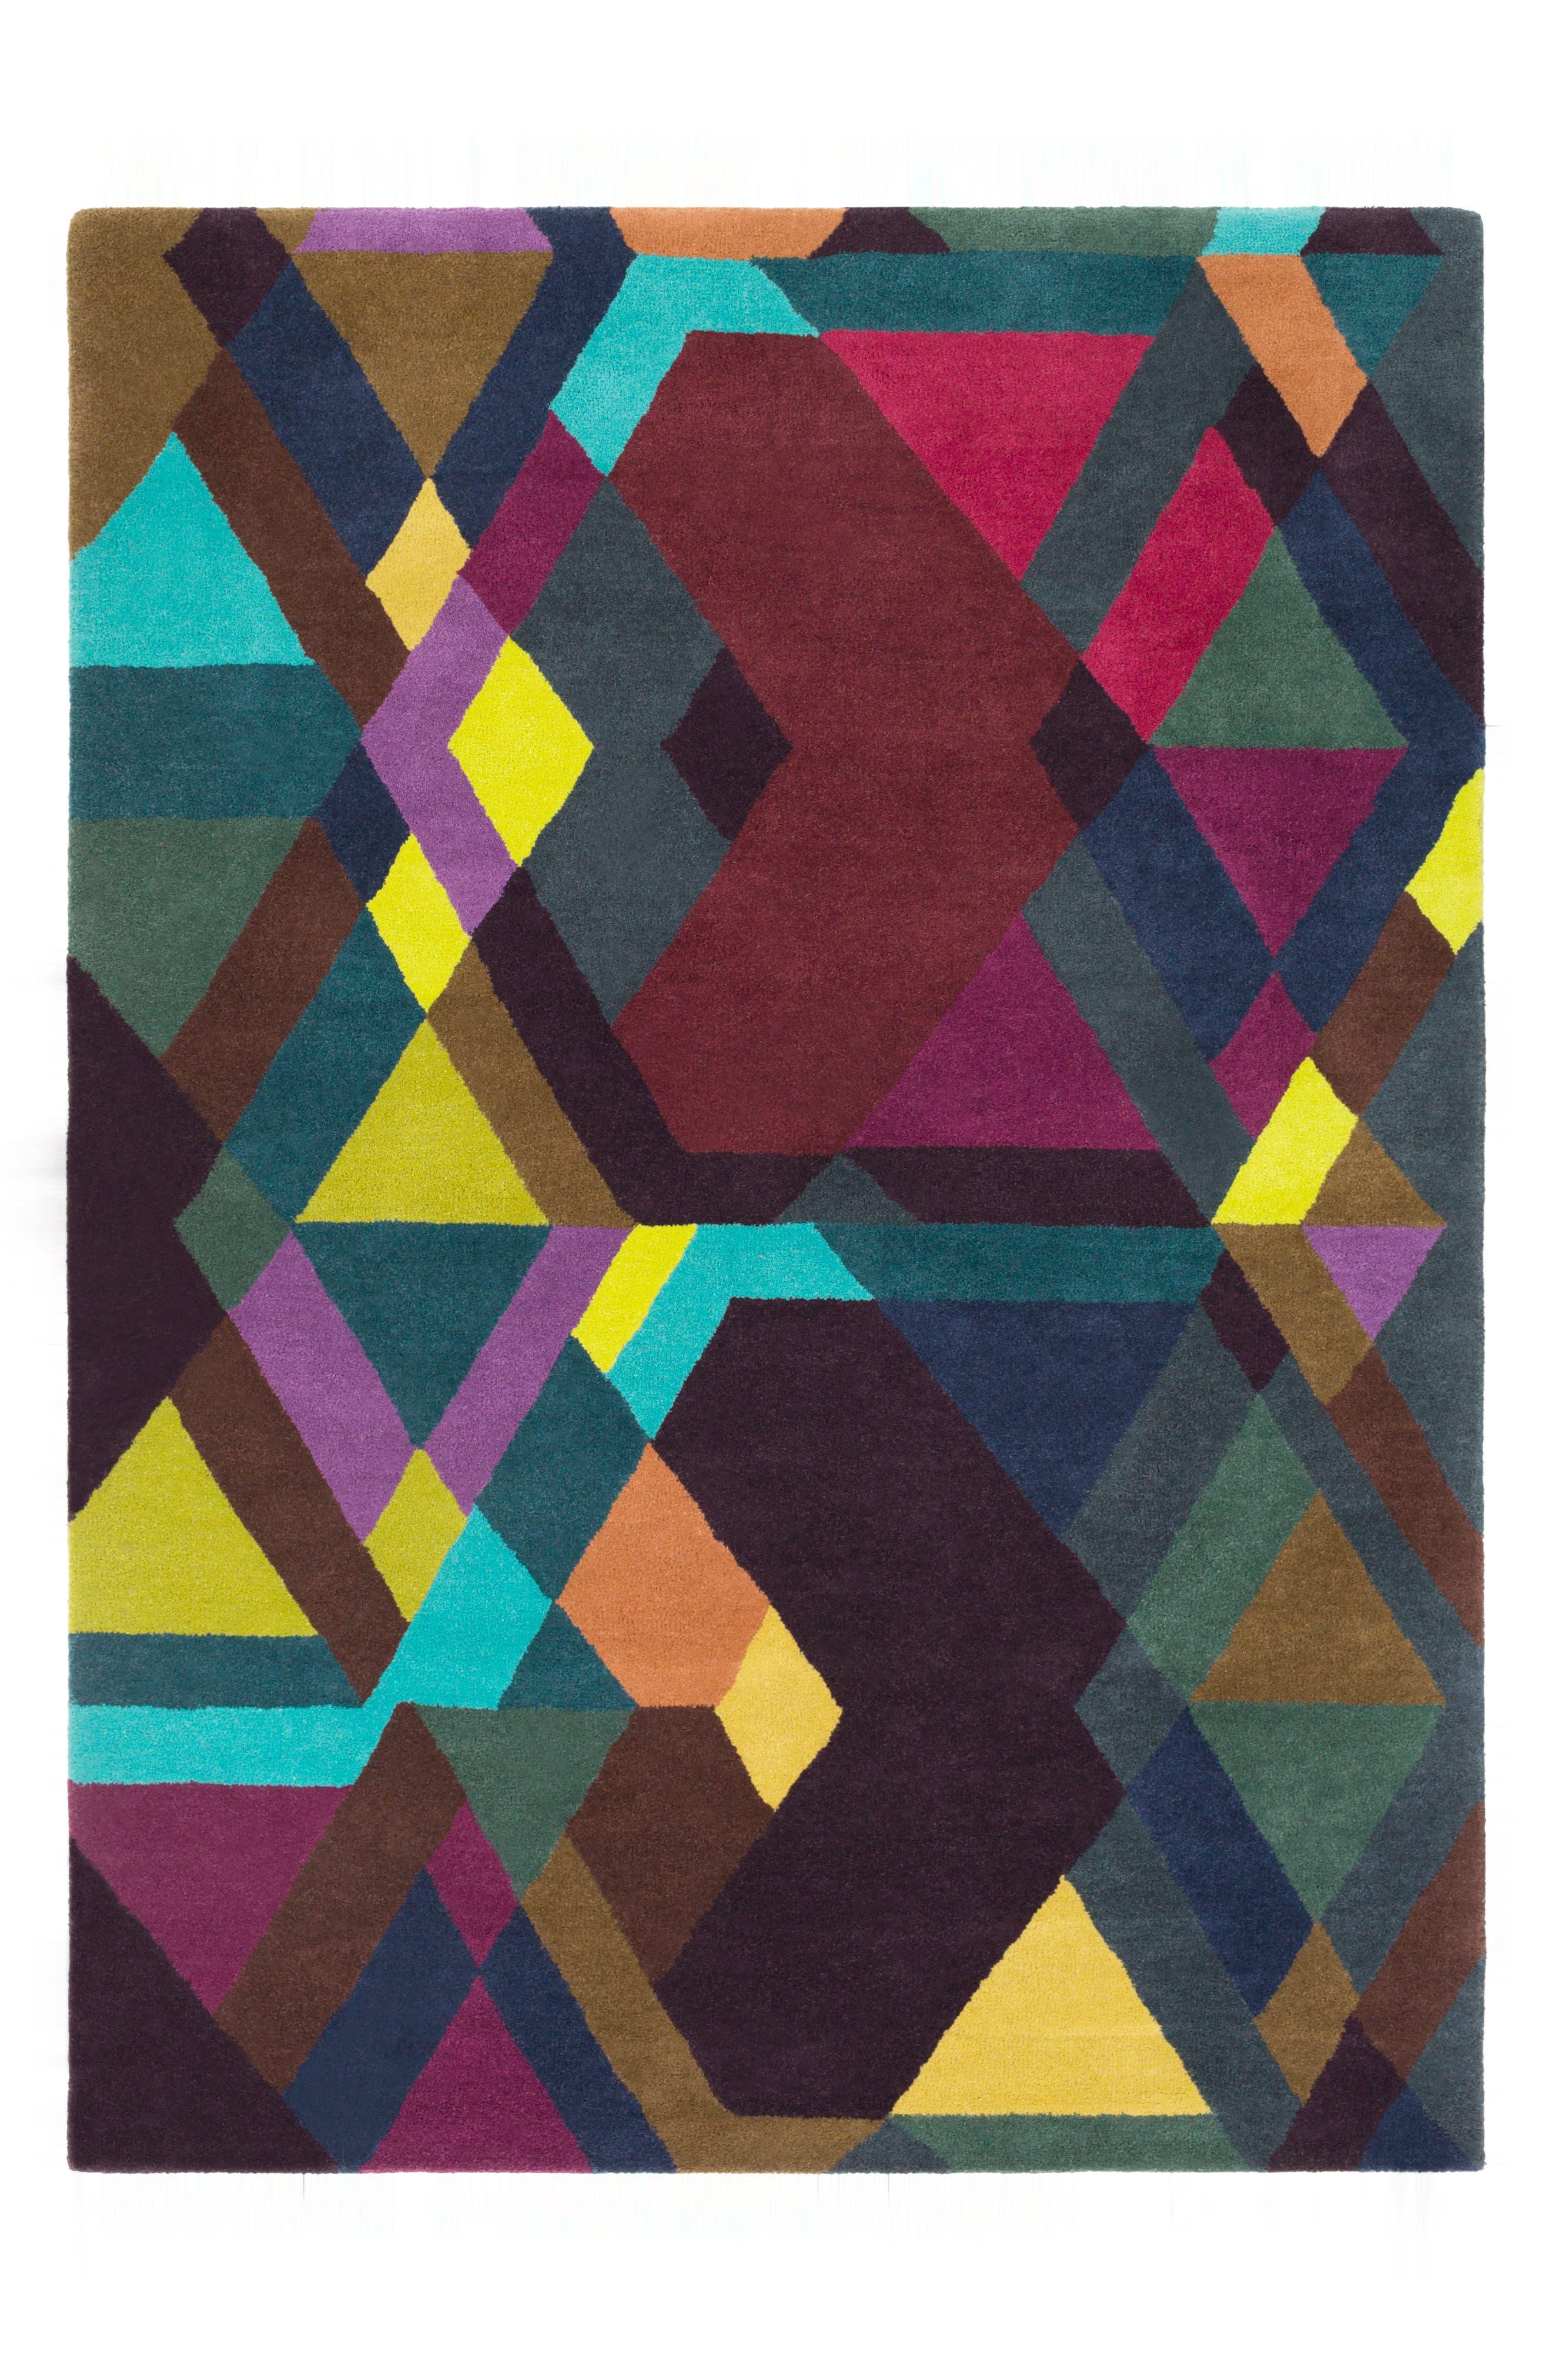 Alternate Image 1 Selected - Ted Baker Rugs x Surya Iconic Wool Area Rug